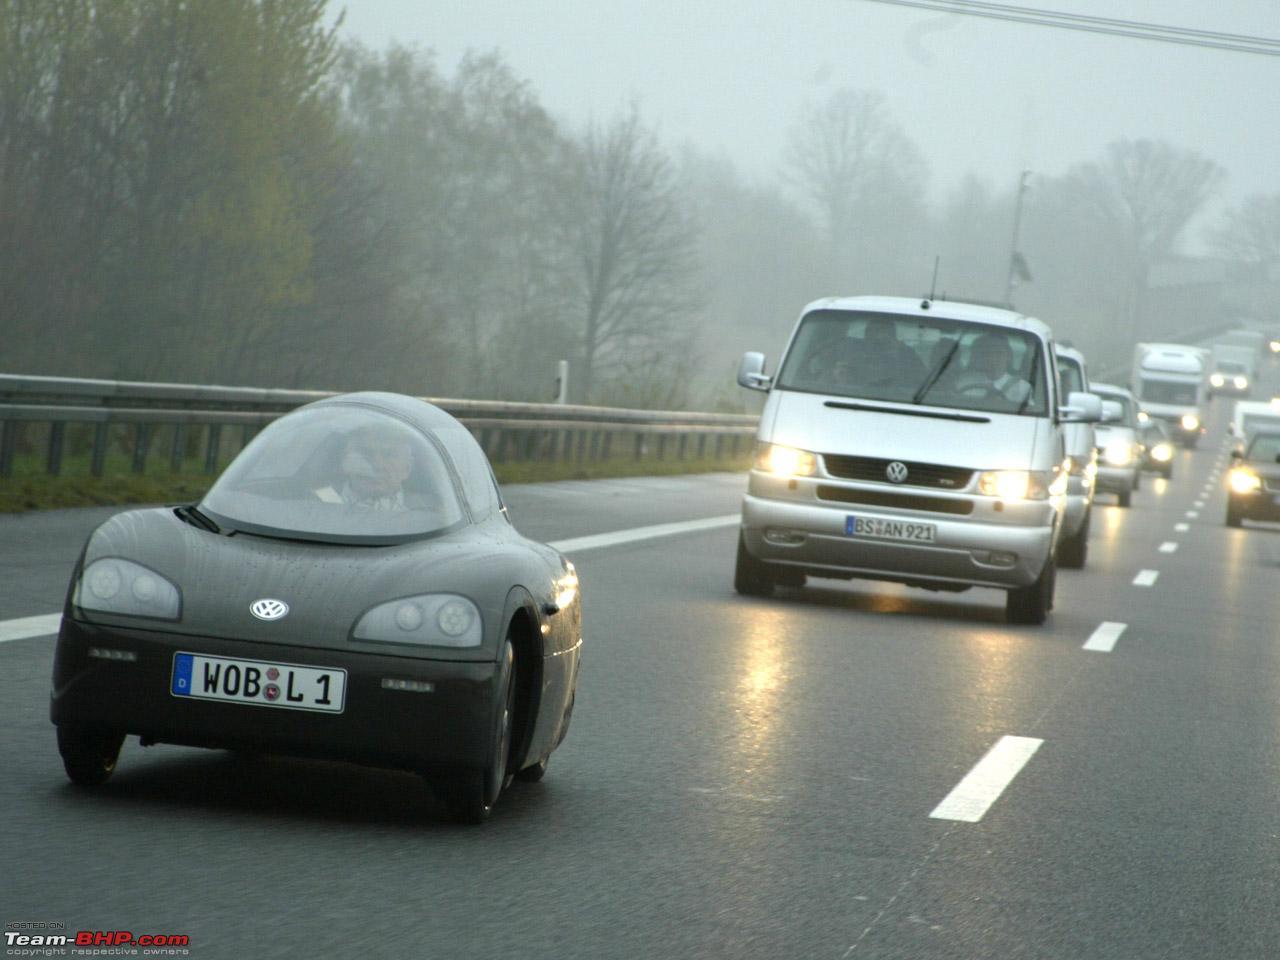 Worlds most fuel efficient car vw 1 liter car mailrediff3